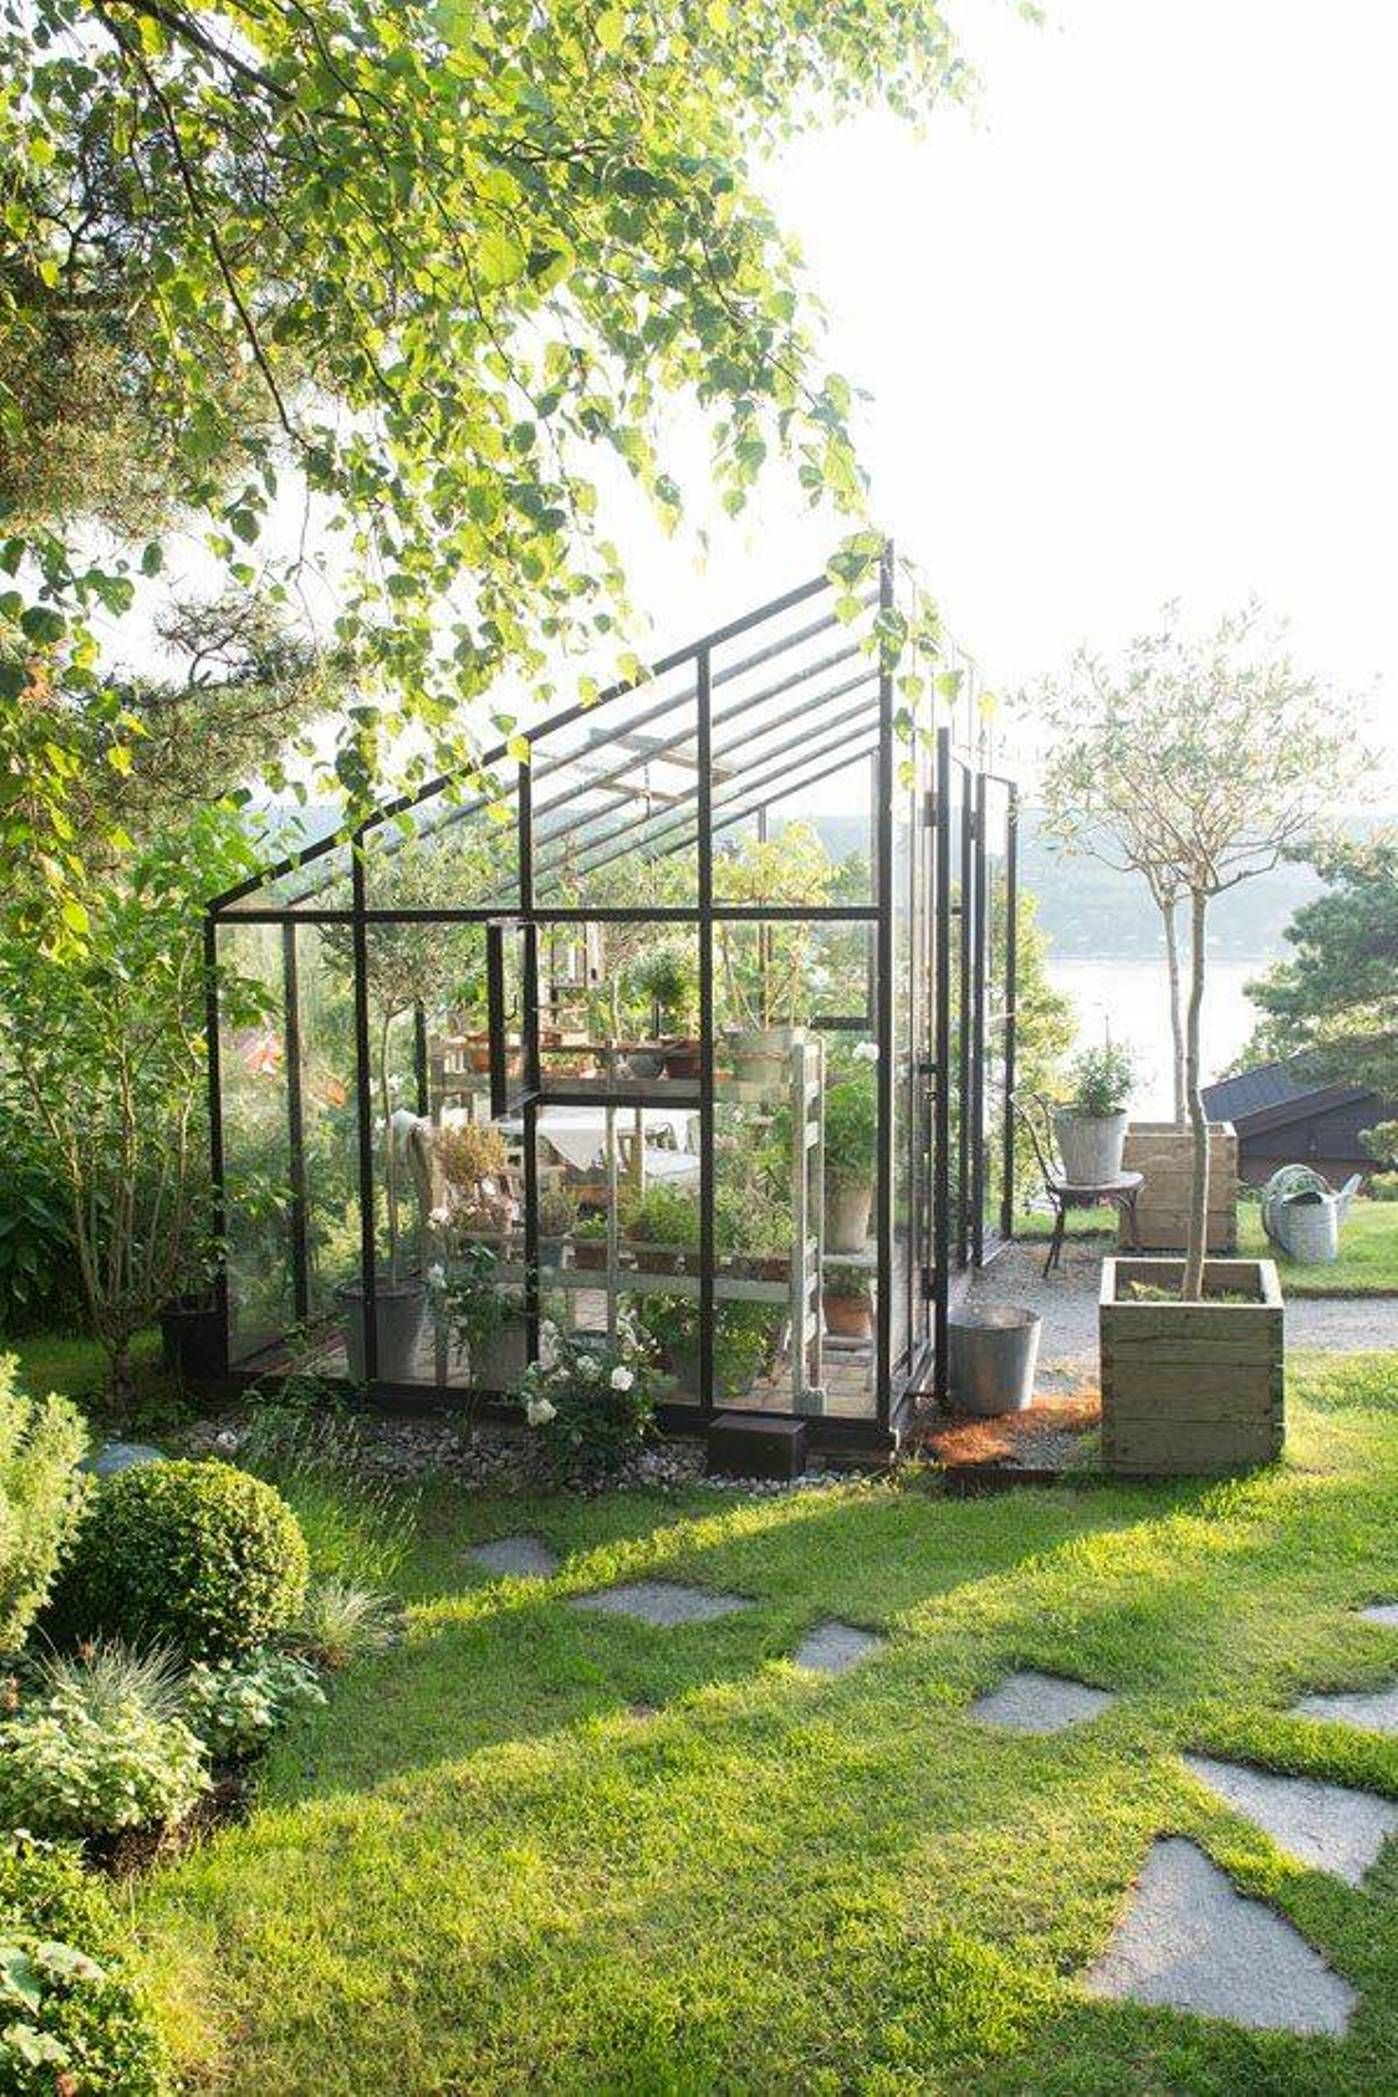 Moderne • Verrière • Jardin D'hiver • Veranda • | Serre ... dedans Verriere Jardin